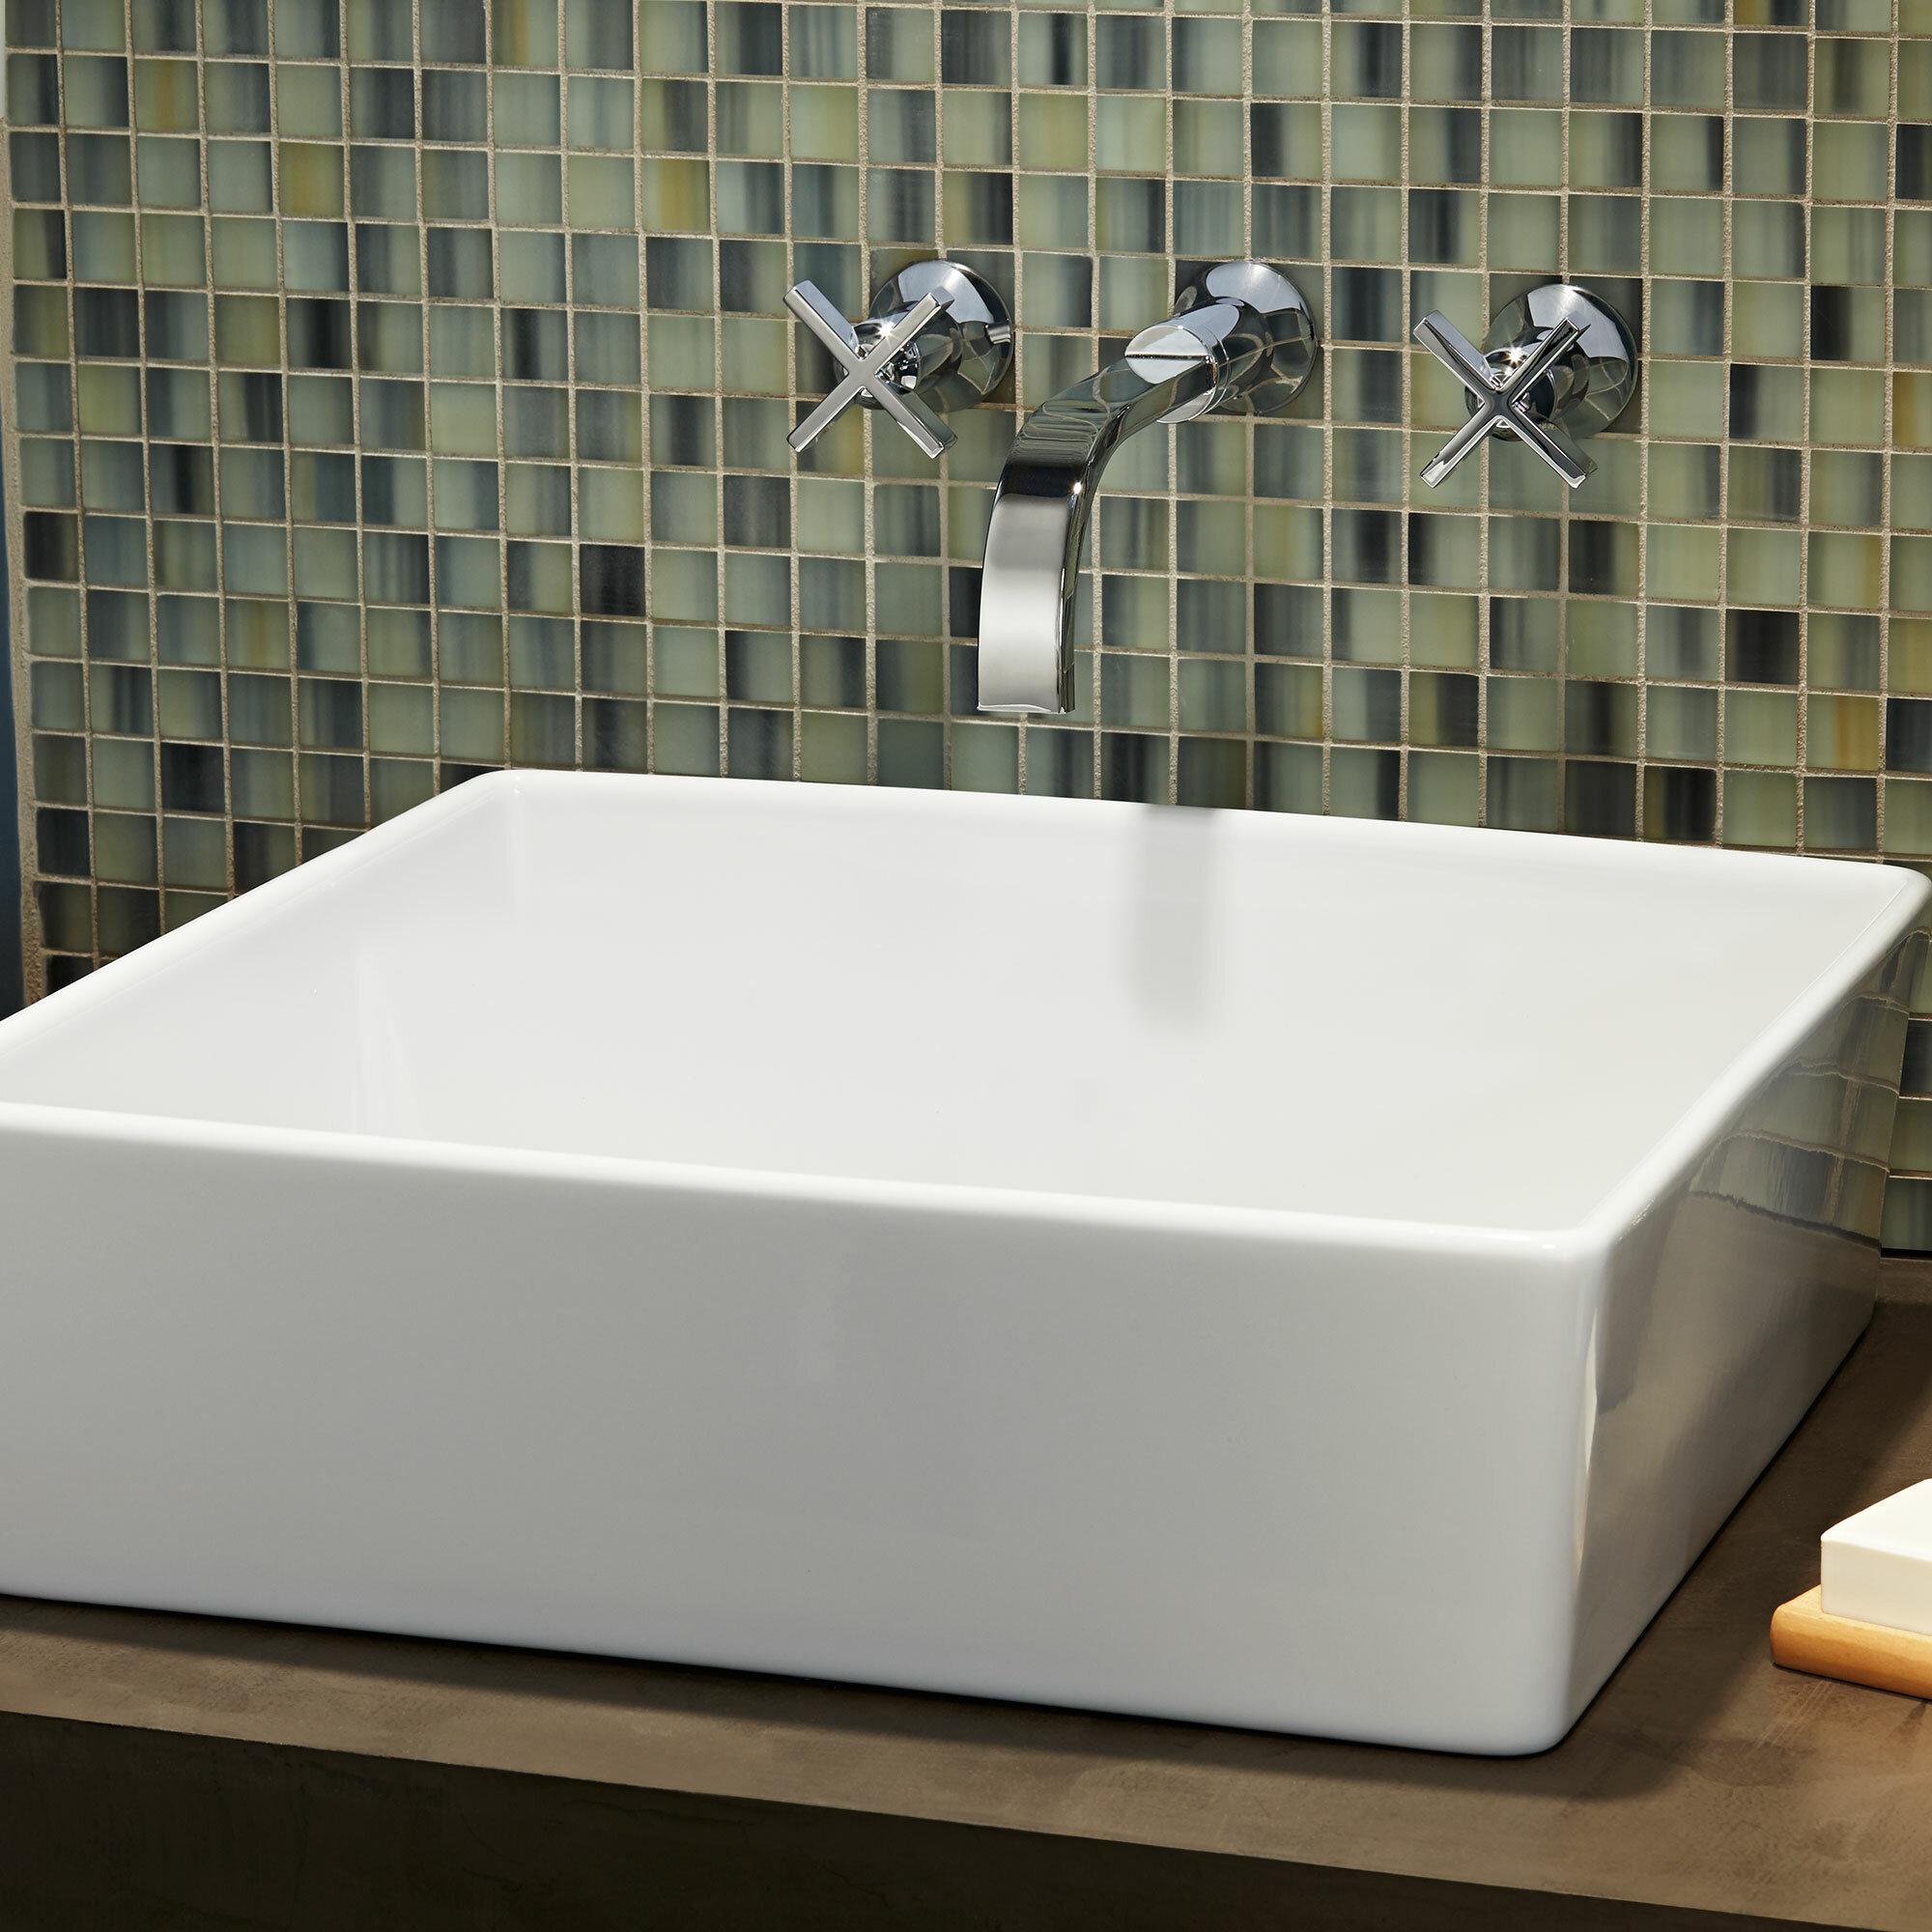 Swell Loft Rectangular Vessel Bathroom Sink Interior Design Ideas Gentotryabchikinfo